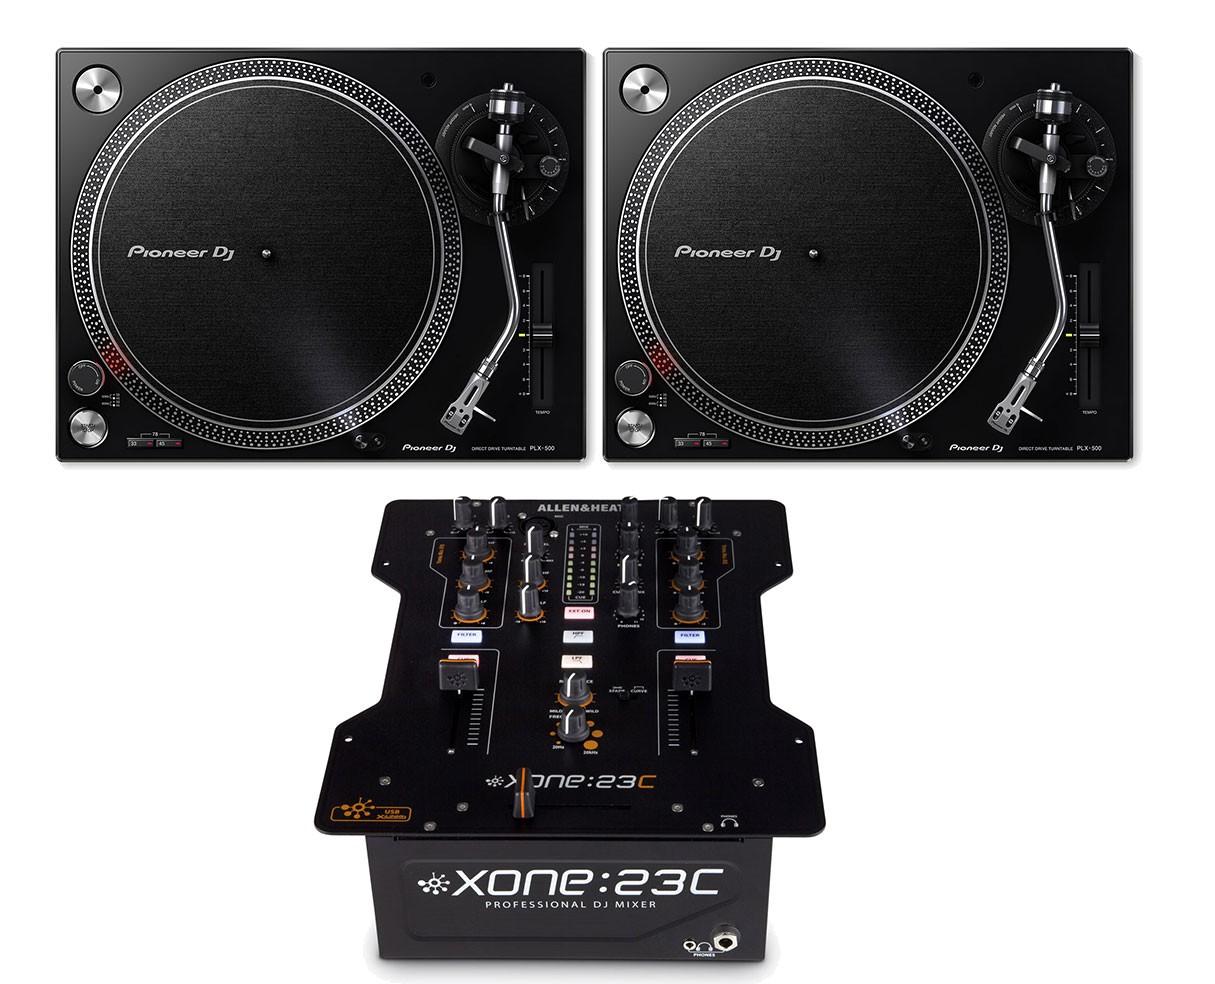 2x Pioneer PLX-500 + Allen & Heath Xone:23C